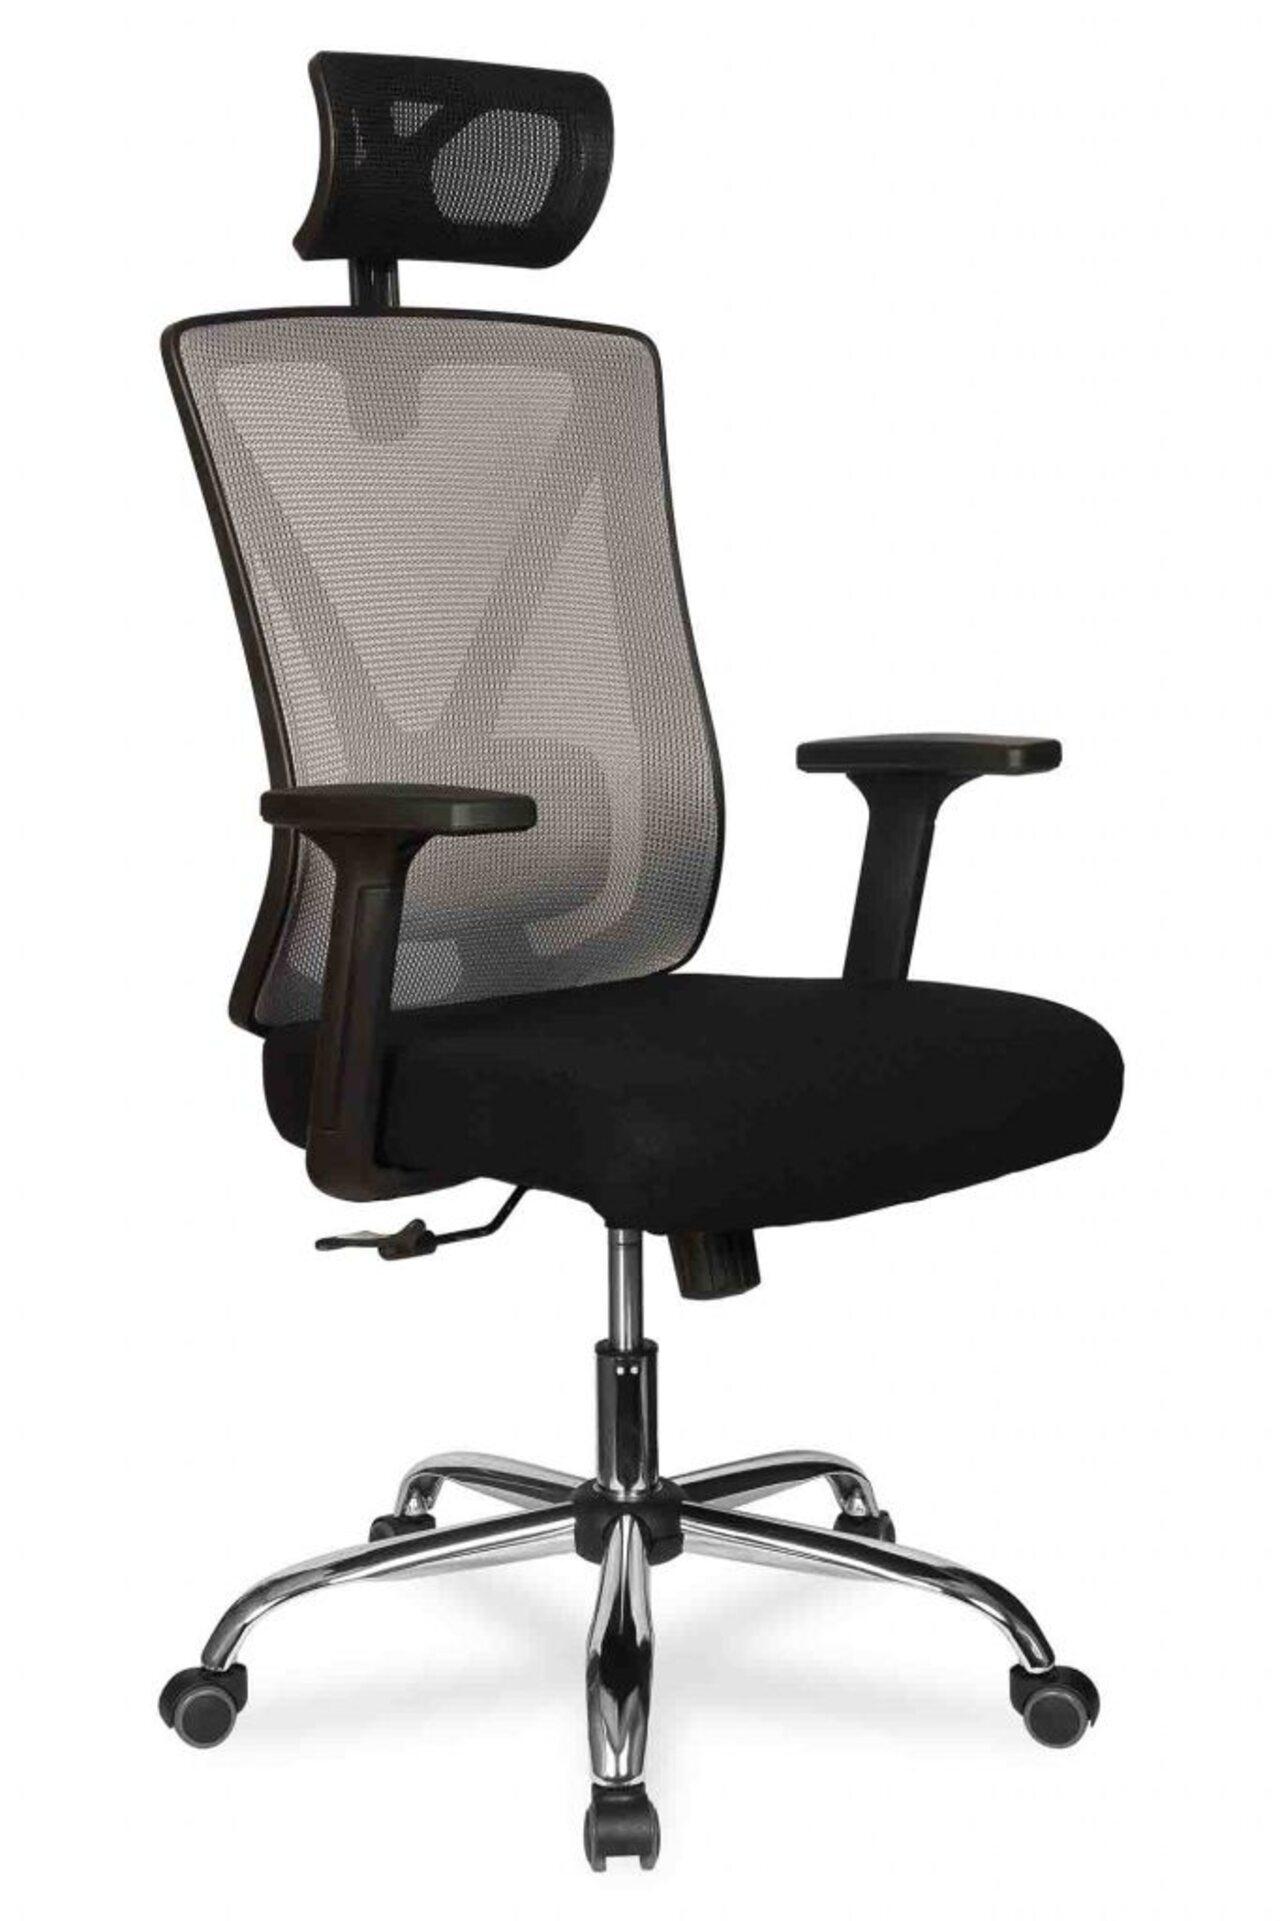 Кресло руководителя College CLG-424 MXH-A - фото 1